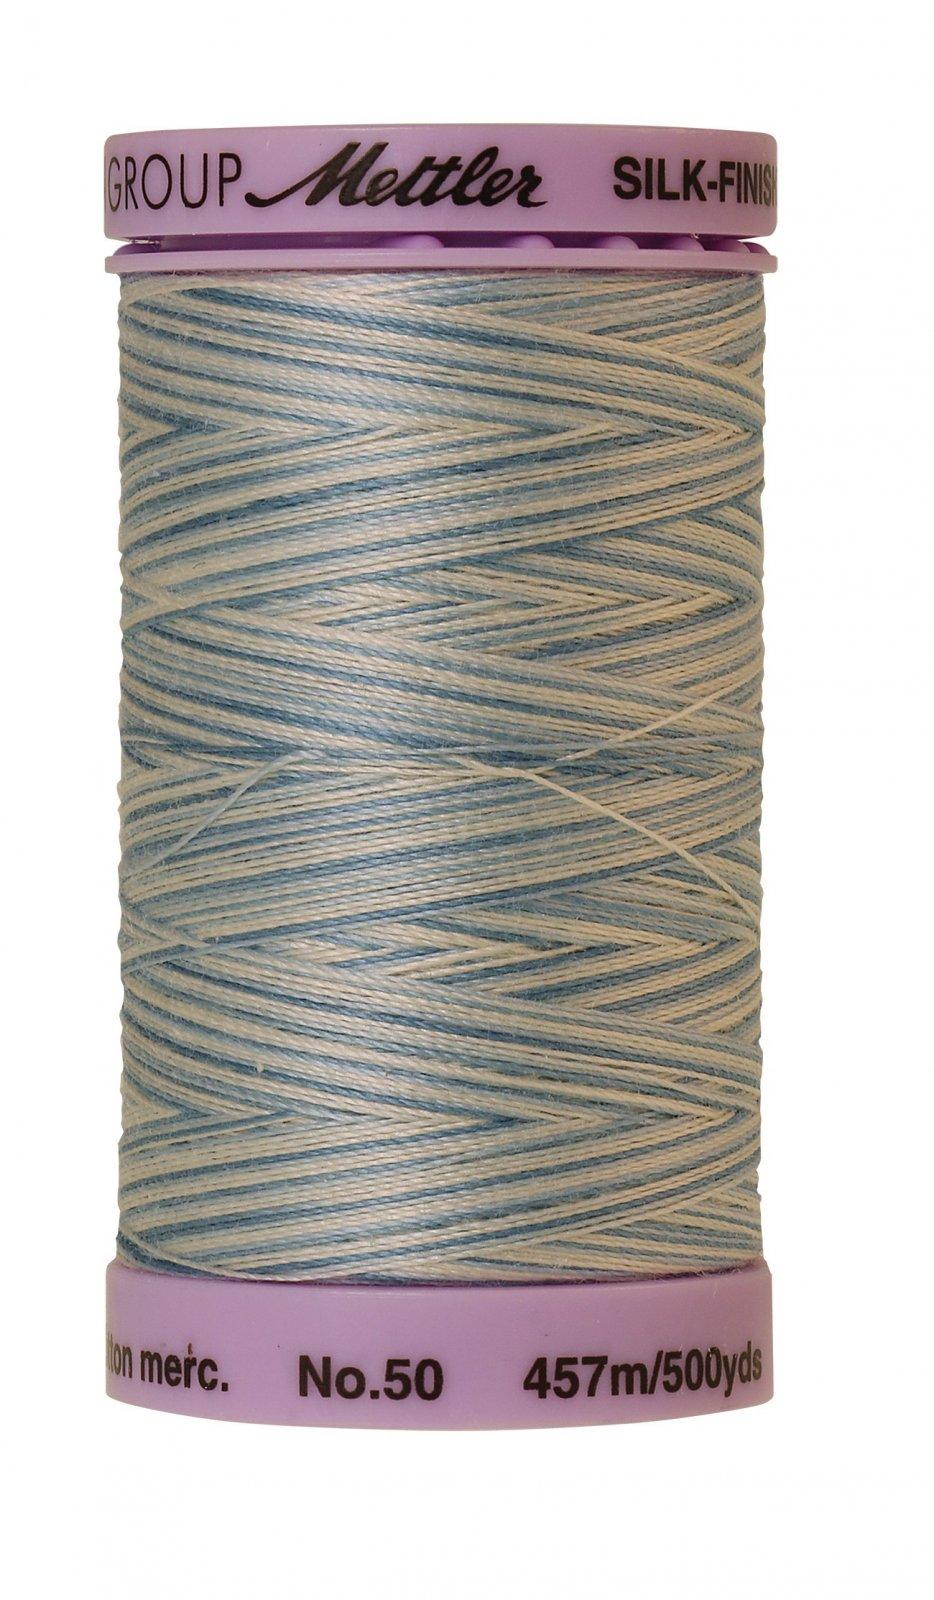 Silk-Finish 50wt Variegated Cotton Thread 457M/500yd Tranquil Blue